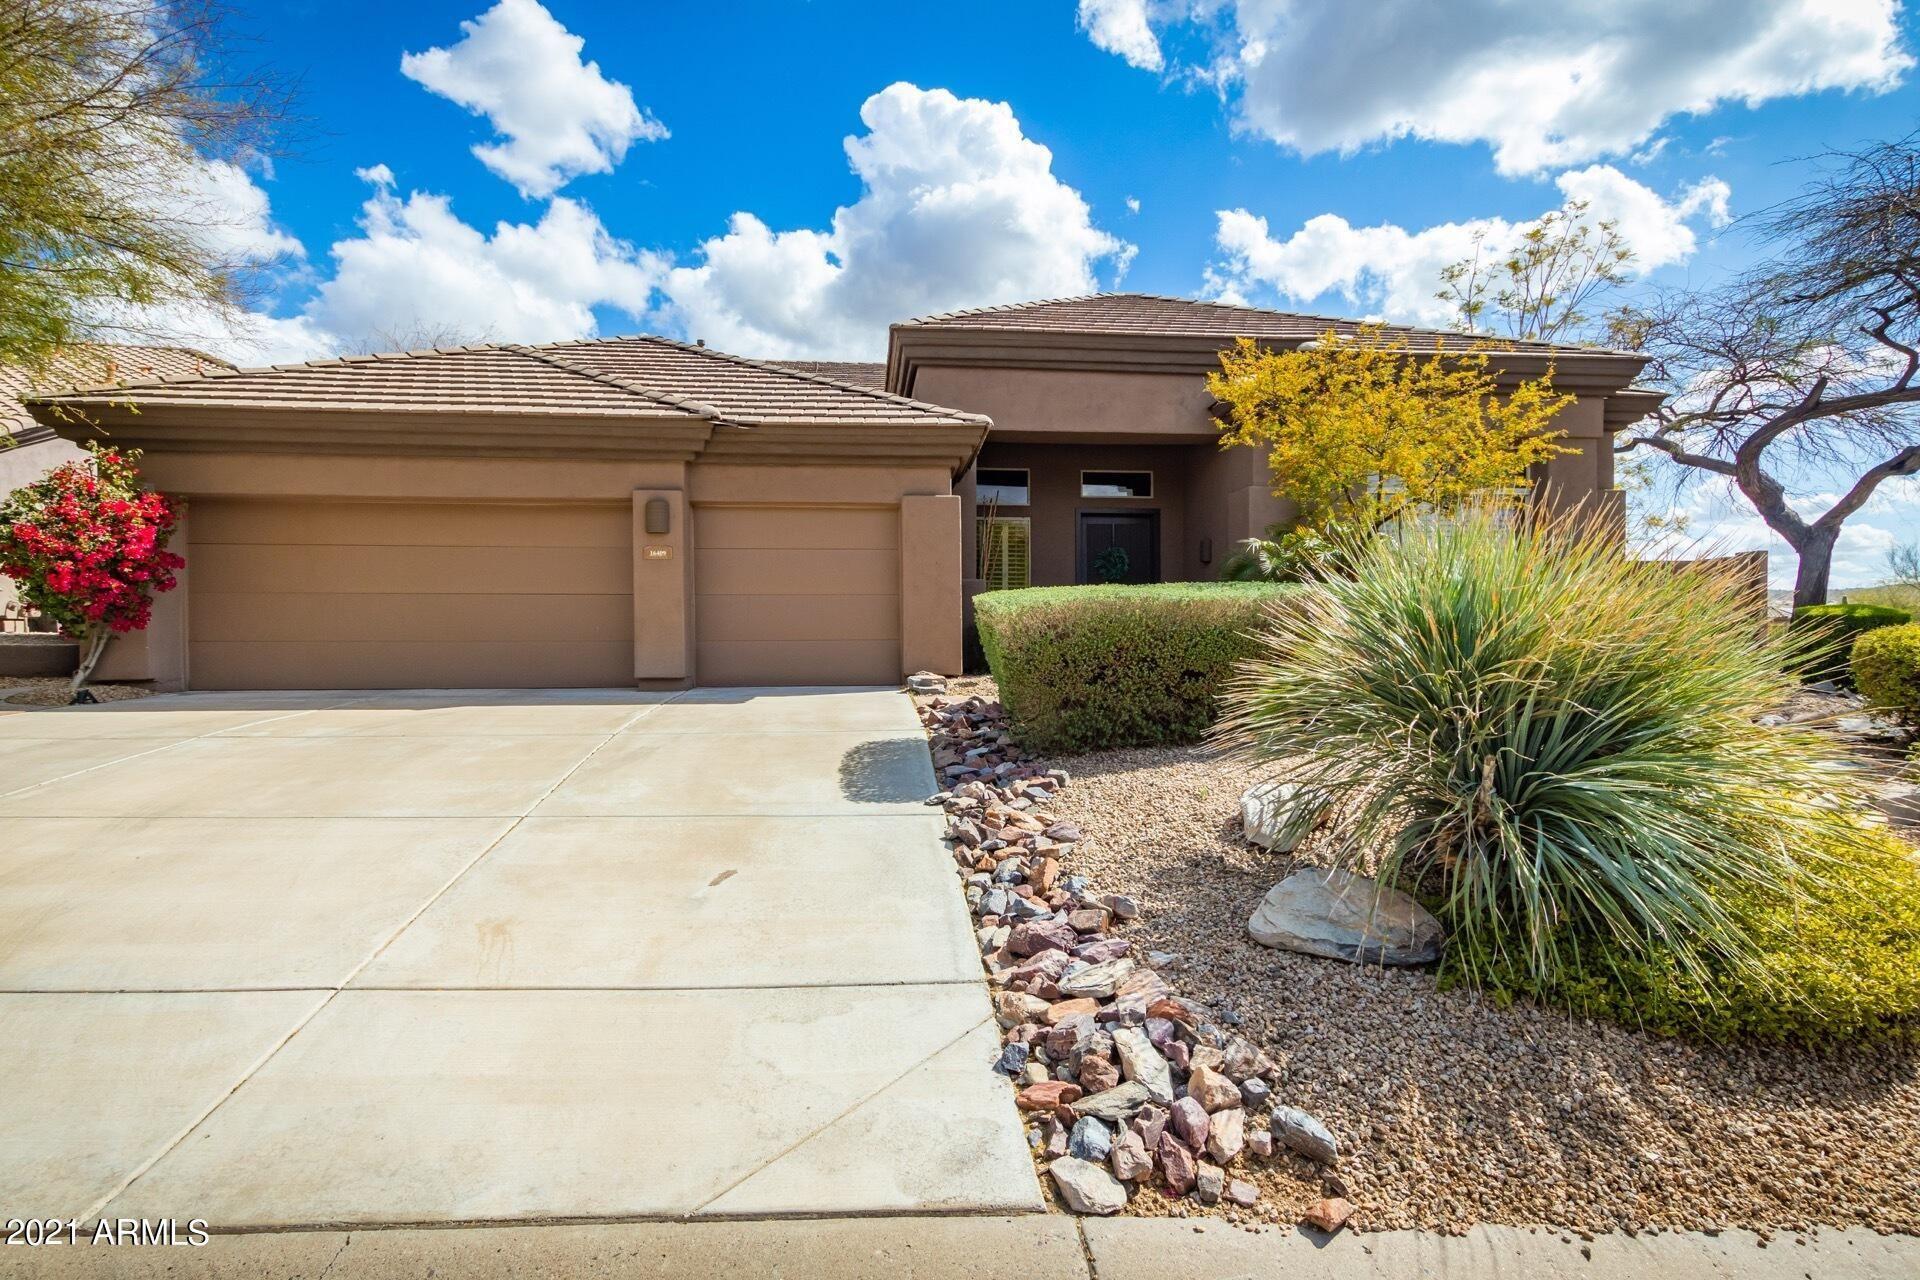 Photo of 16409 N 108TH Way, Scottsdale, AZ 85255 (MLS # 6204011)